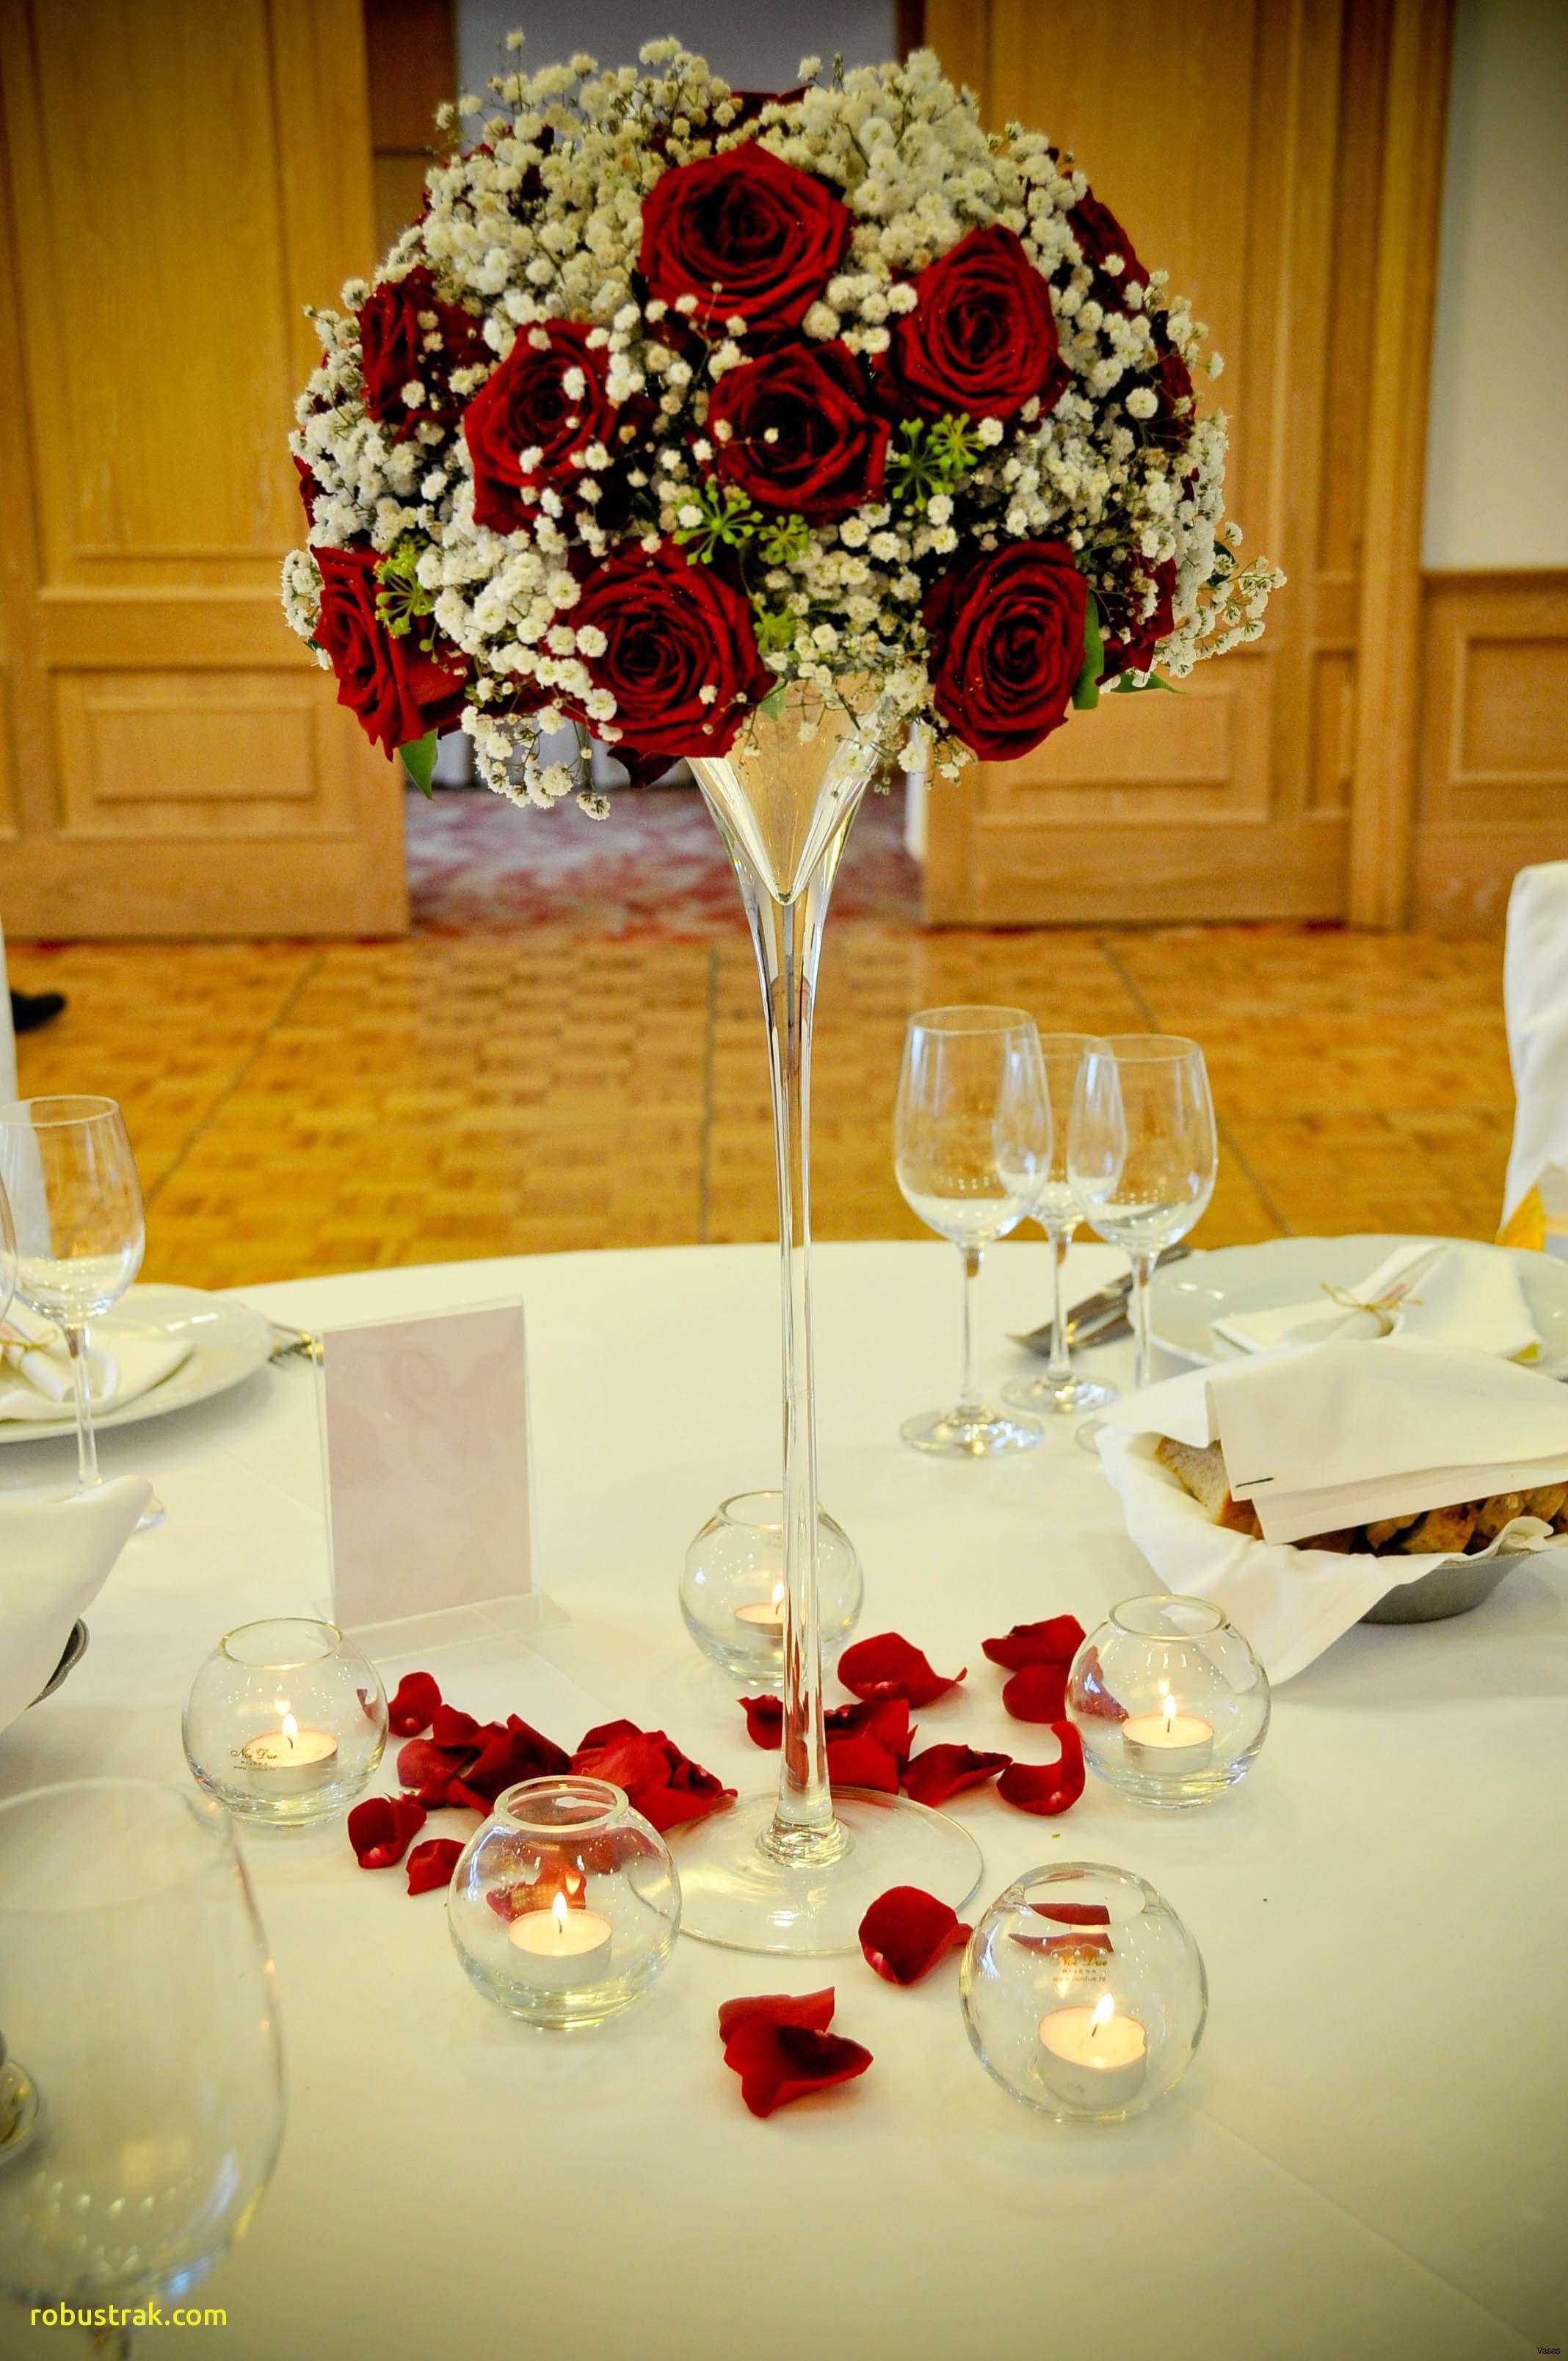 vase flower holder of awesome flower decoration ideas for home home design ideas within vases martini vase with ivory roses i 0d michaels 60cm to buy 50cm design flower